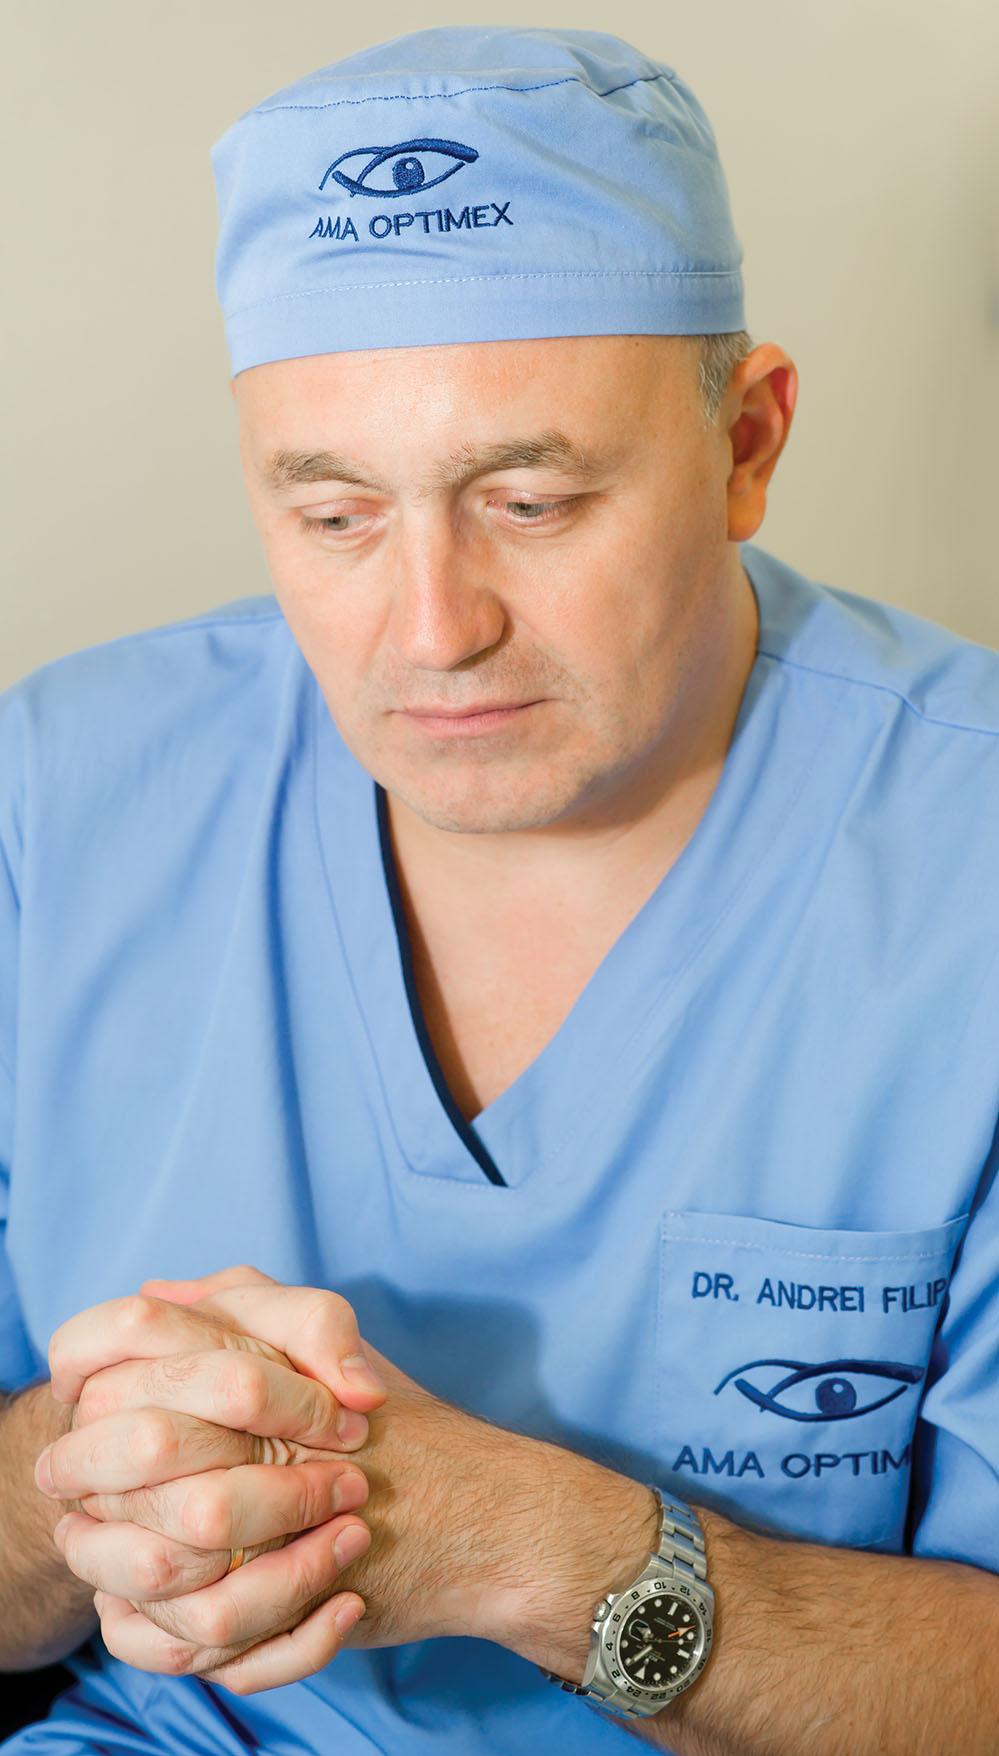 dr. Andrei Filip, clinica Ama Optimex